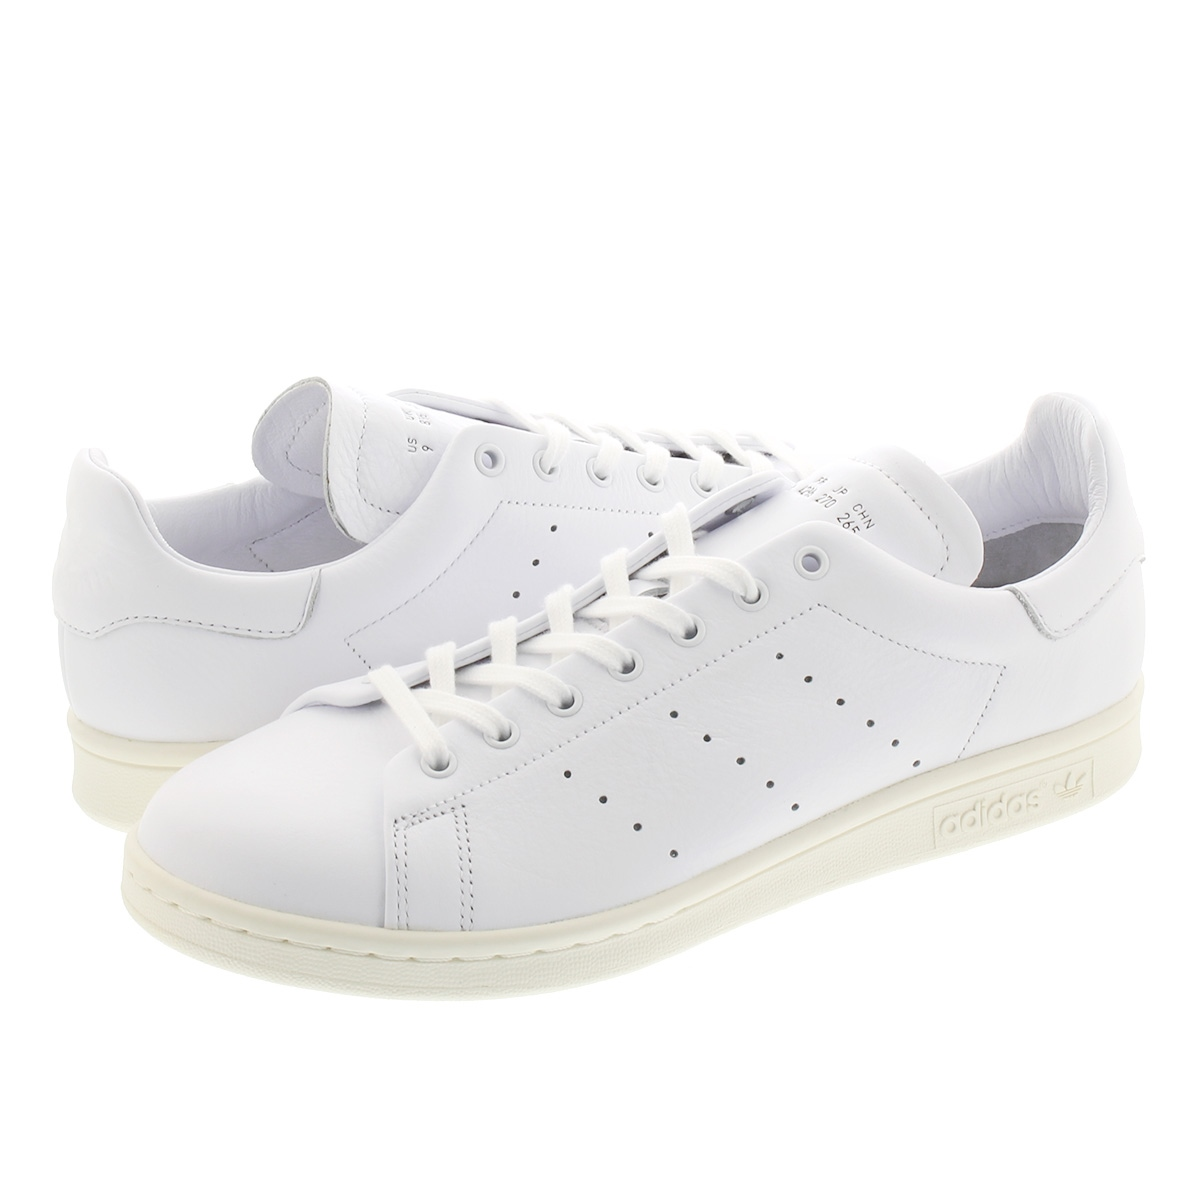 adidas Stan Smith Recon Ee5790 Sneakersnstuff   sneakers